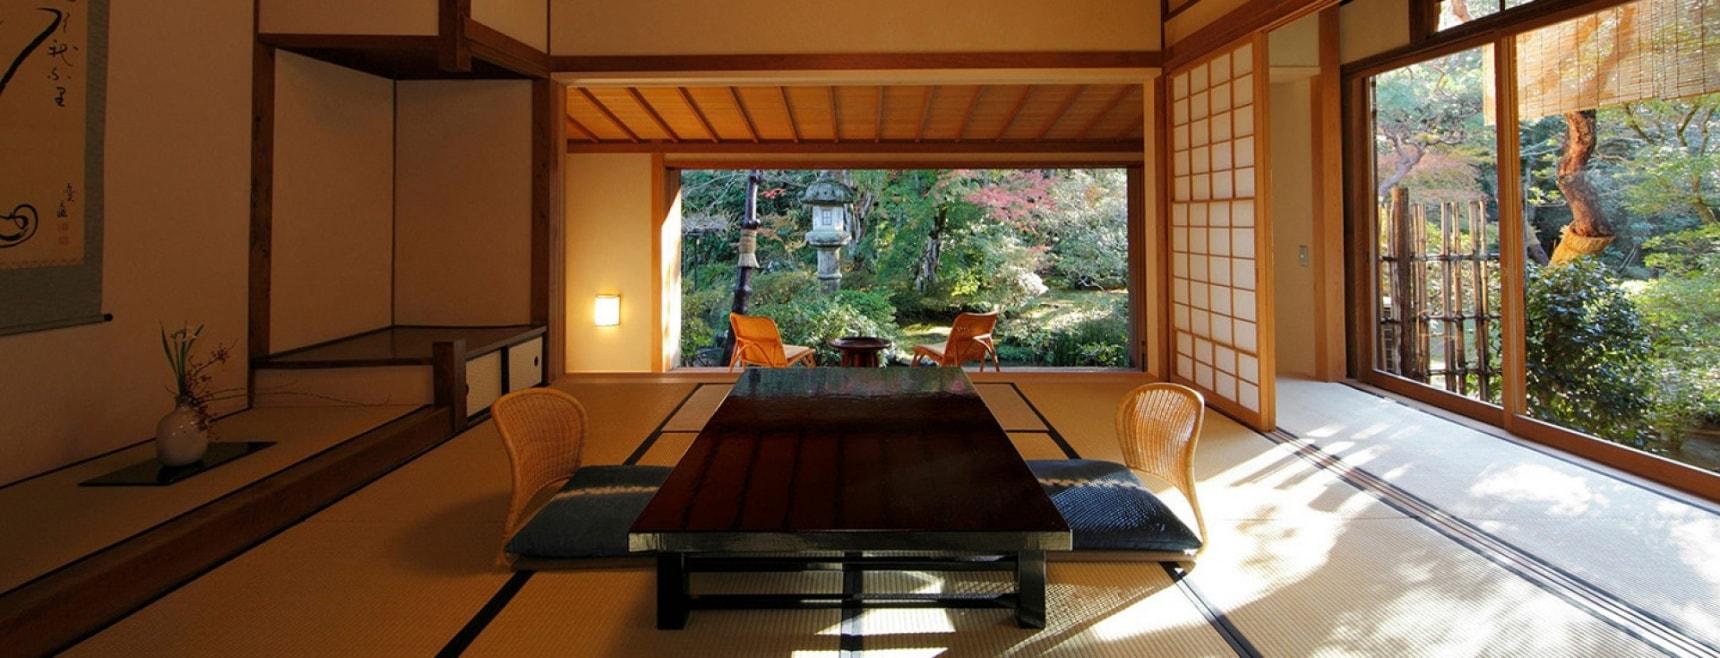 Wonders of Japan: Hospitality